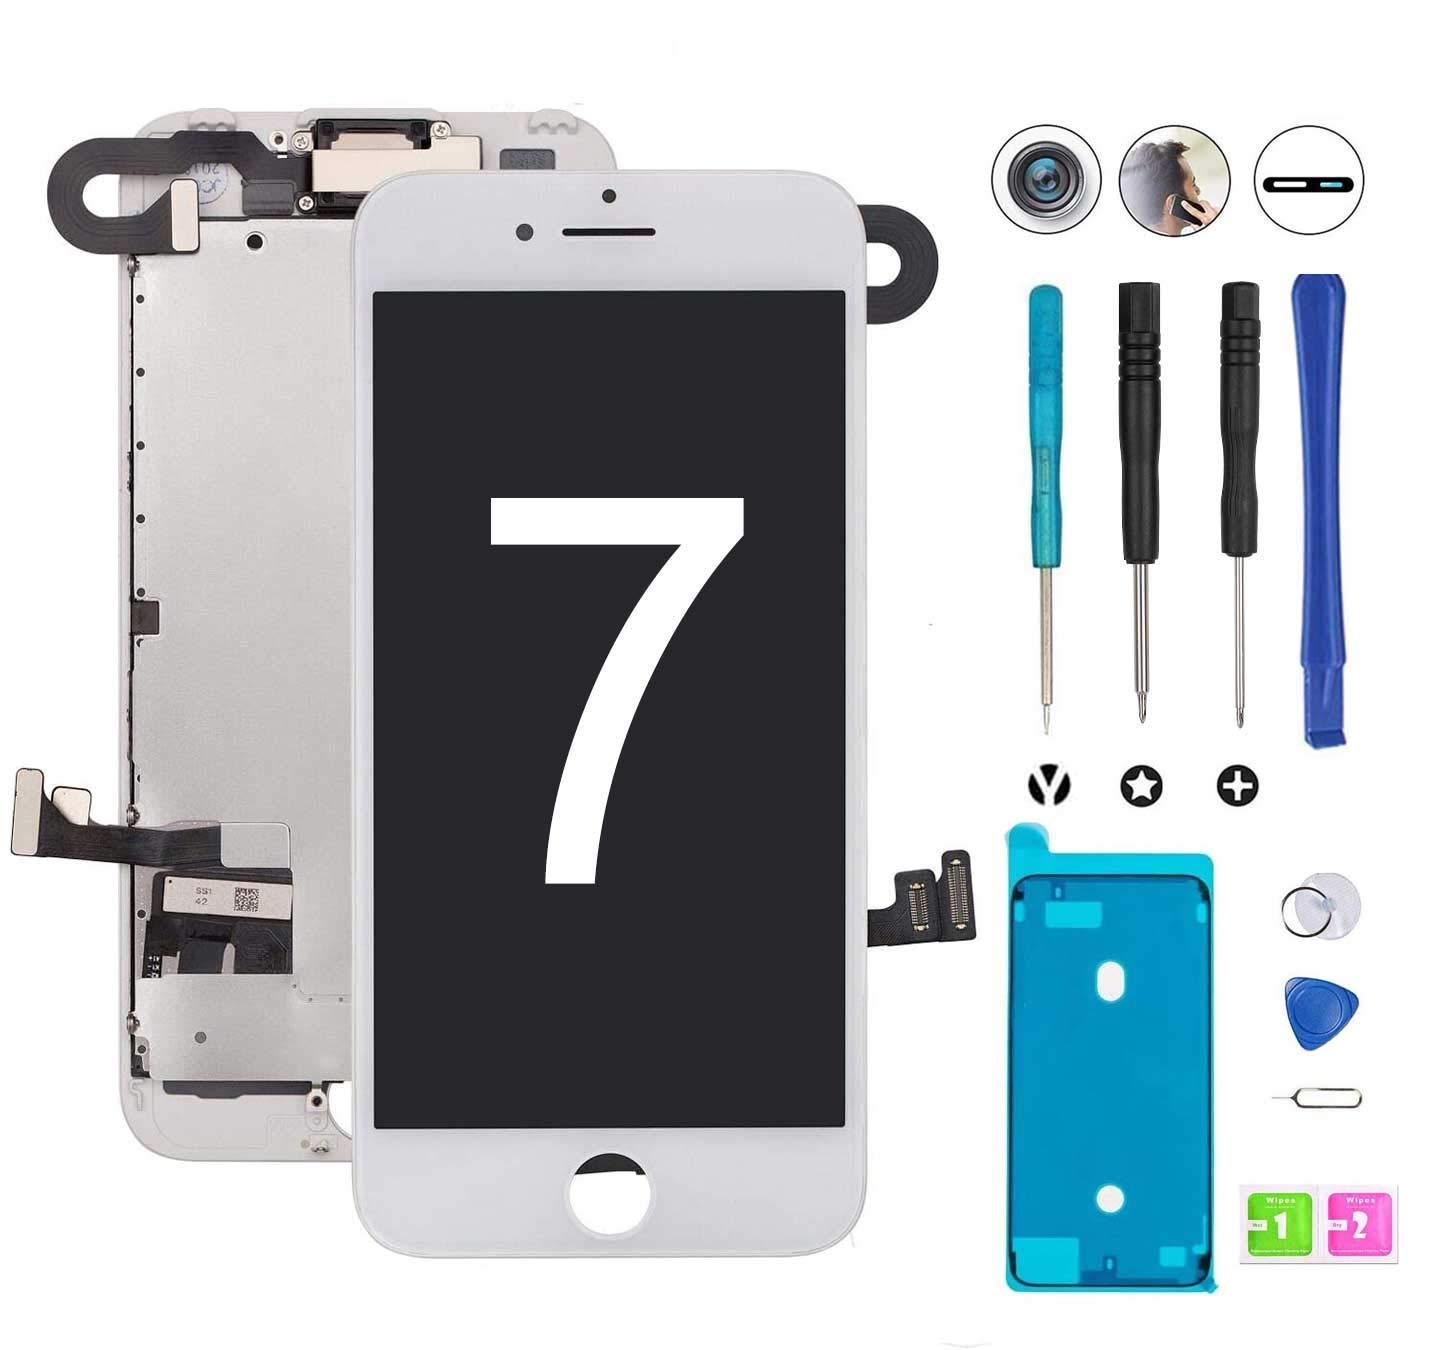 Modulo LCD Blanco para IPhone 7 4.7 inch -379